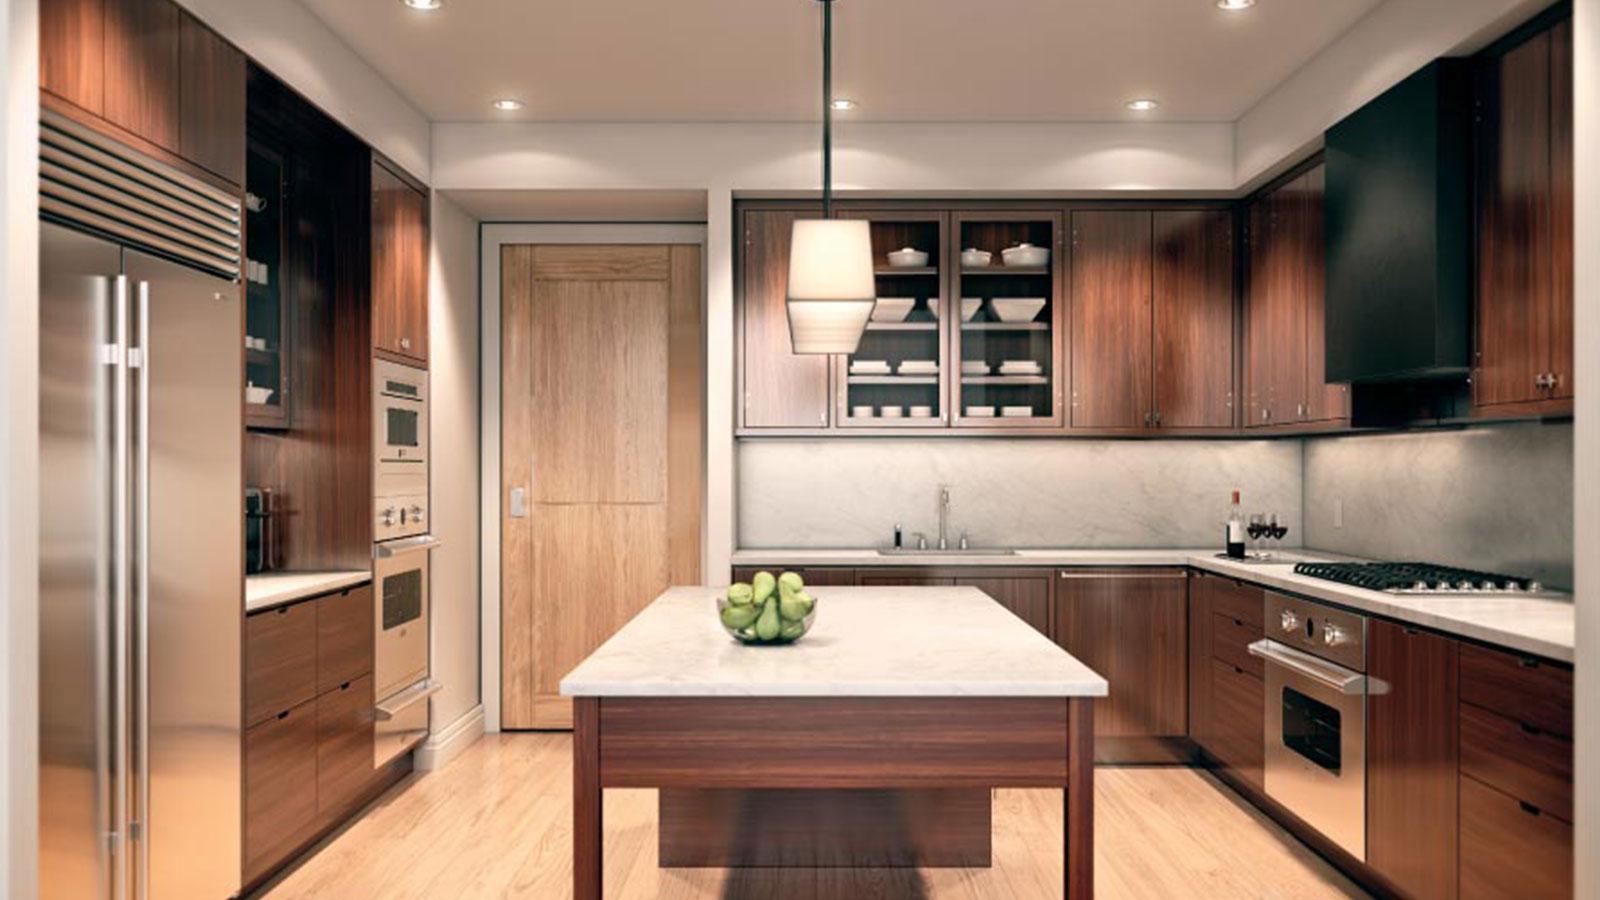 Sterling Mason, 71 Laight Street, Luxury Condo, Manhattan, New York City